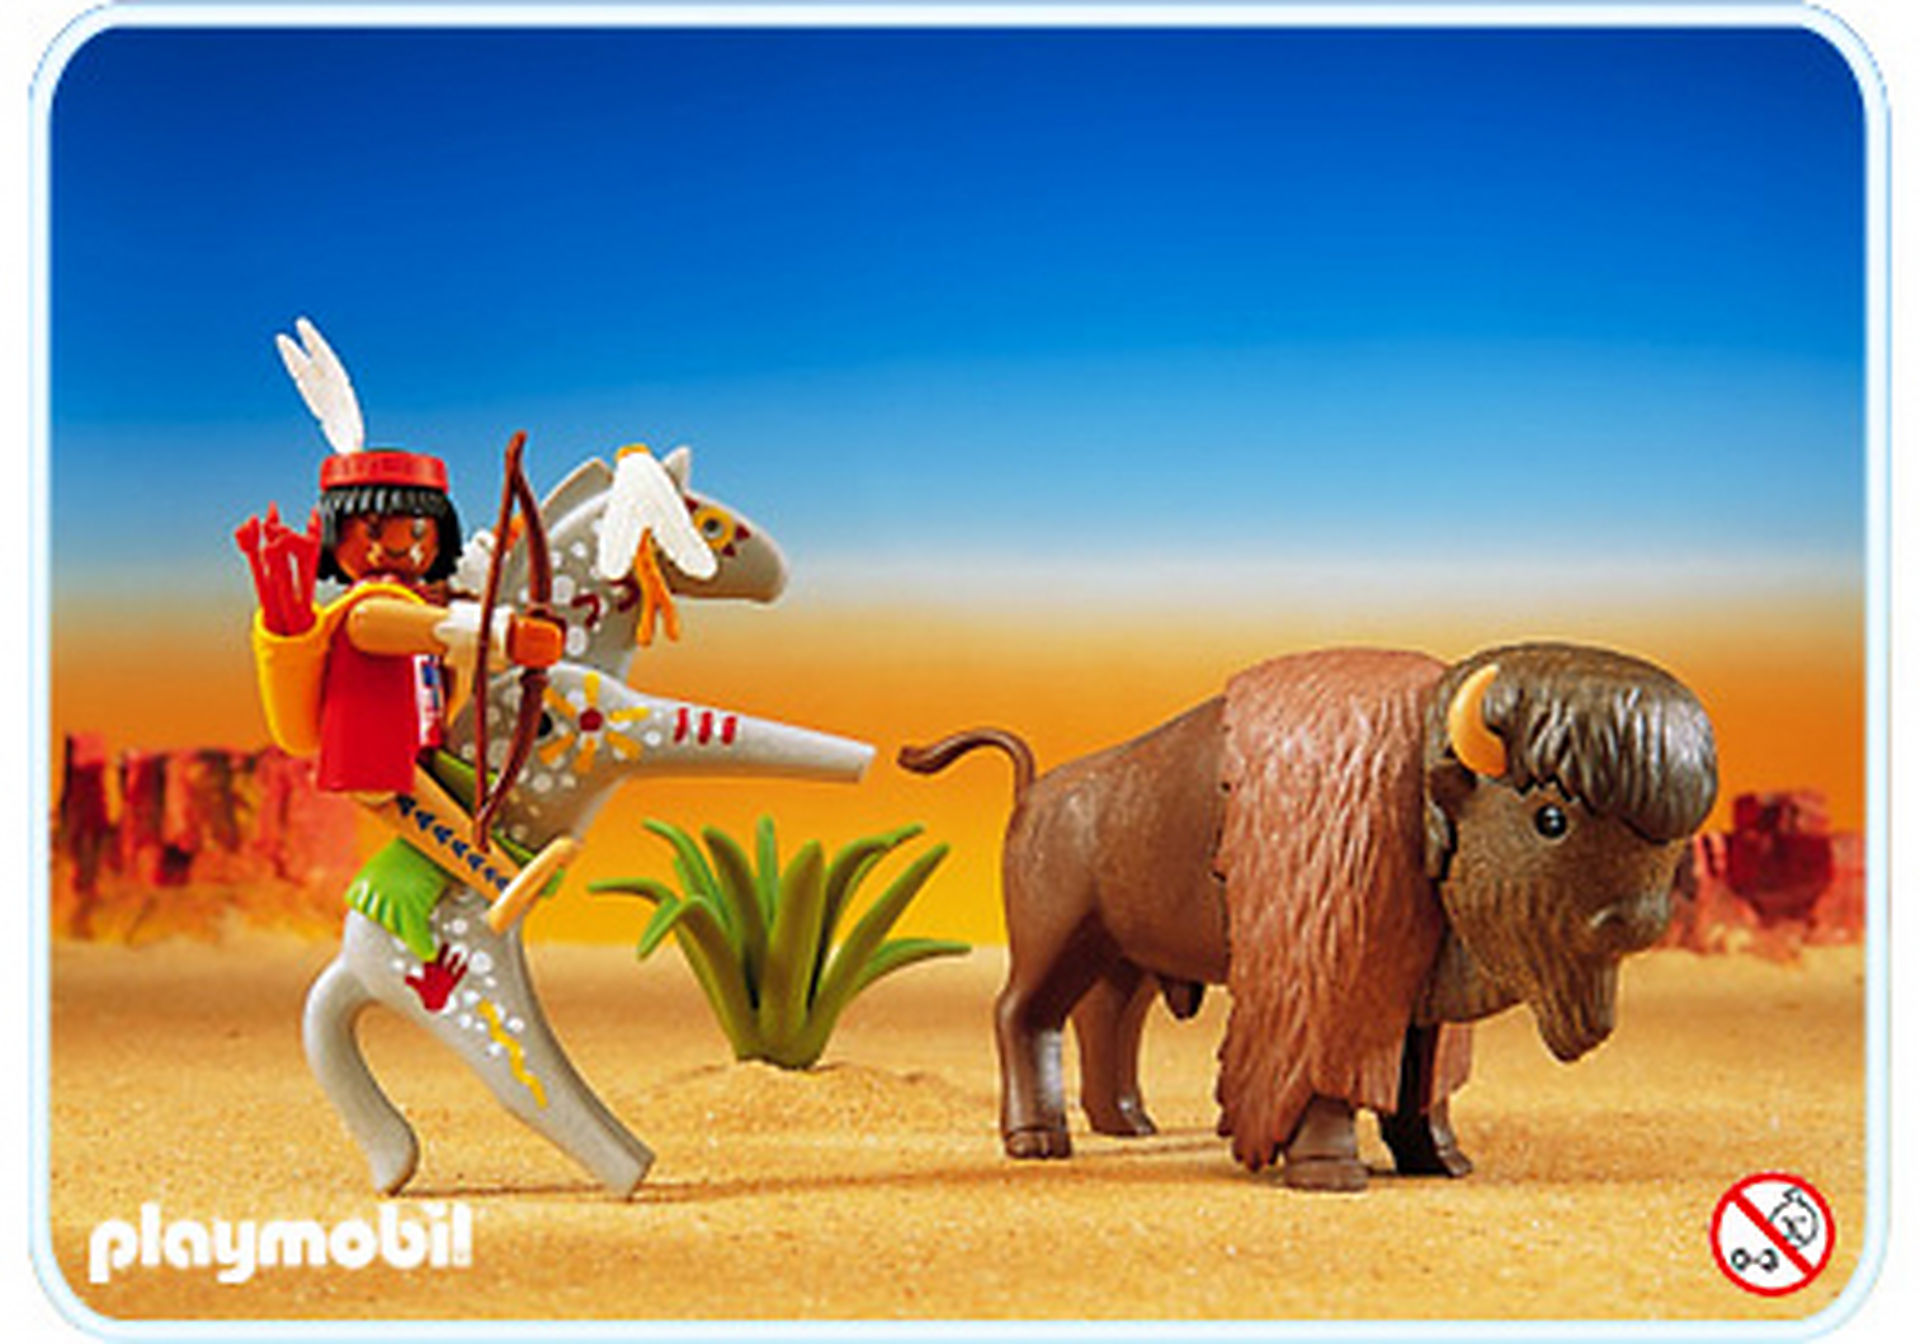 http://media.playmobil.com/i/playmobil/3731-A_product_detail/Bison und Indianer mit Pferd